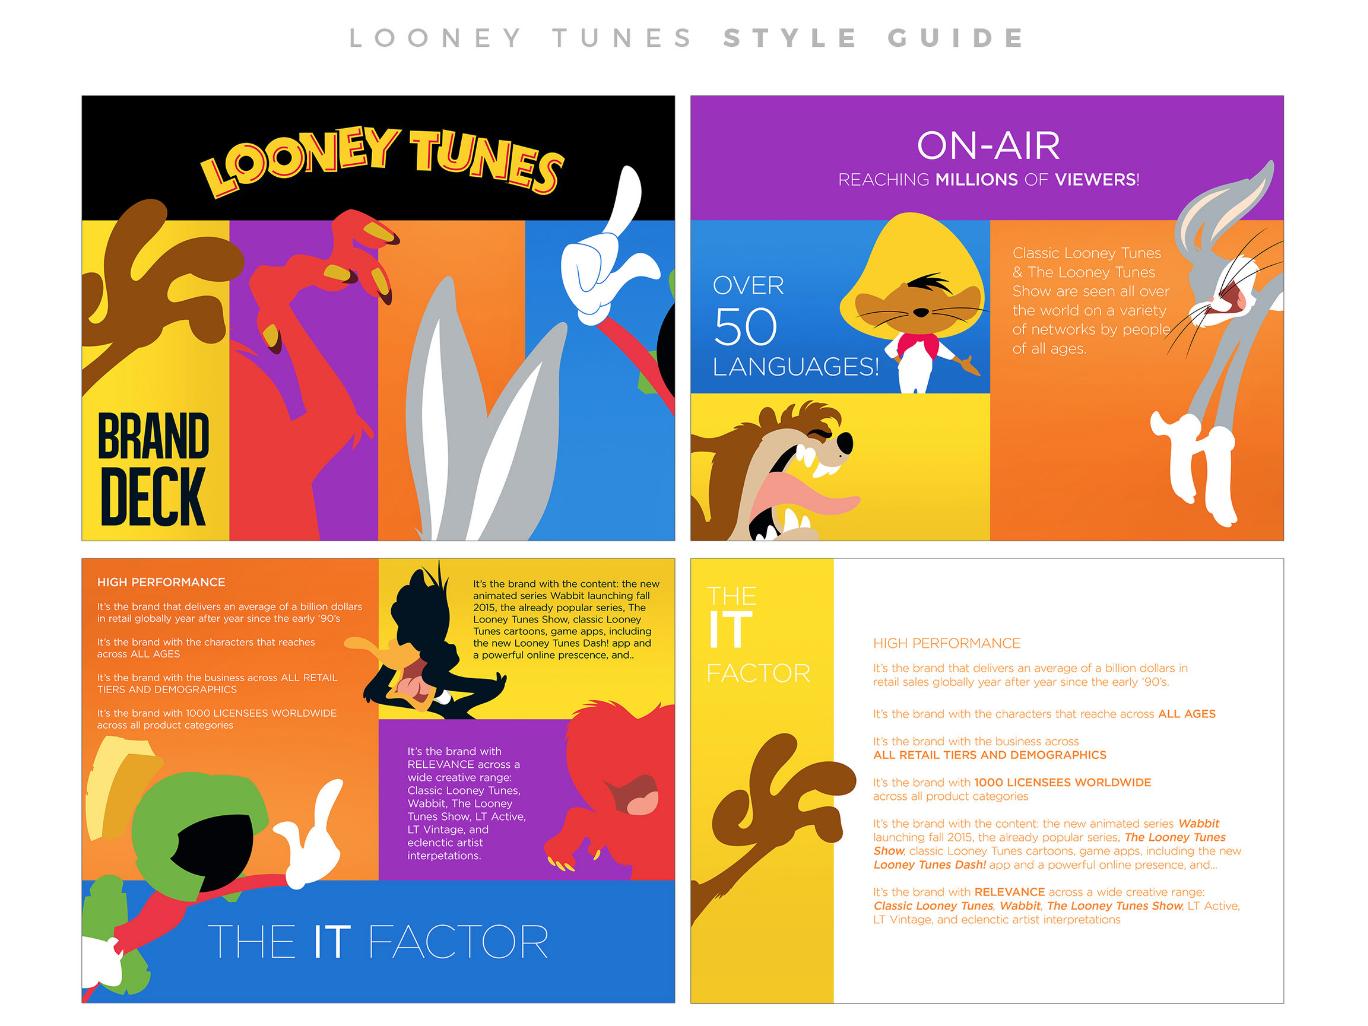 Looney Tunes Brand Deck warner bros design illustration brand direction buggs bunny cartoon style guide pitch deck looney tunes brand design